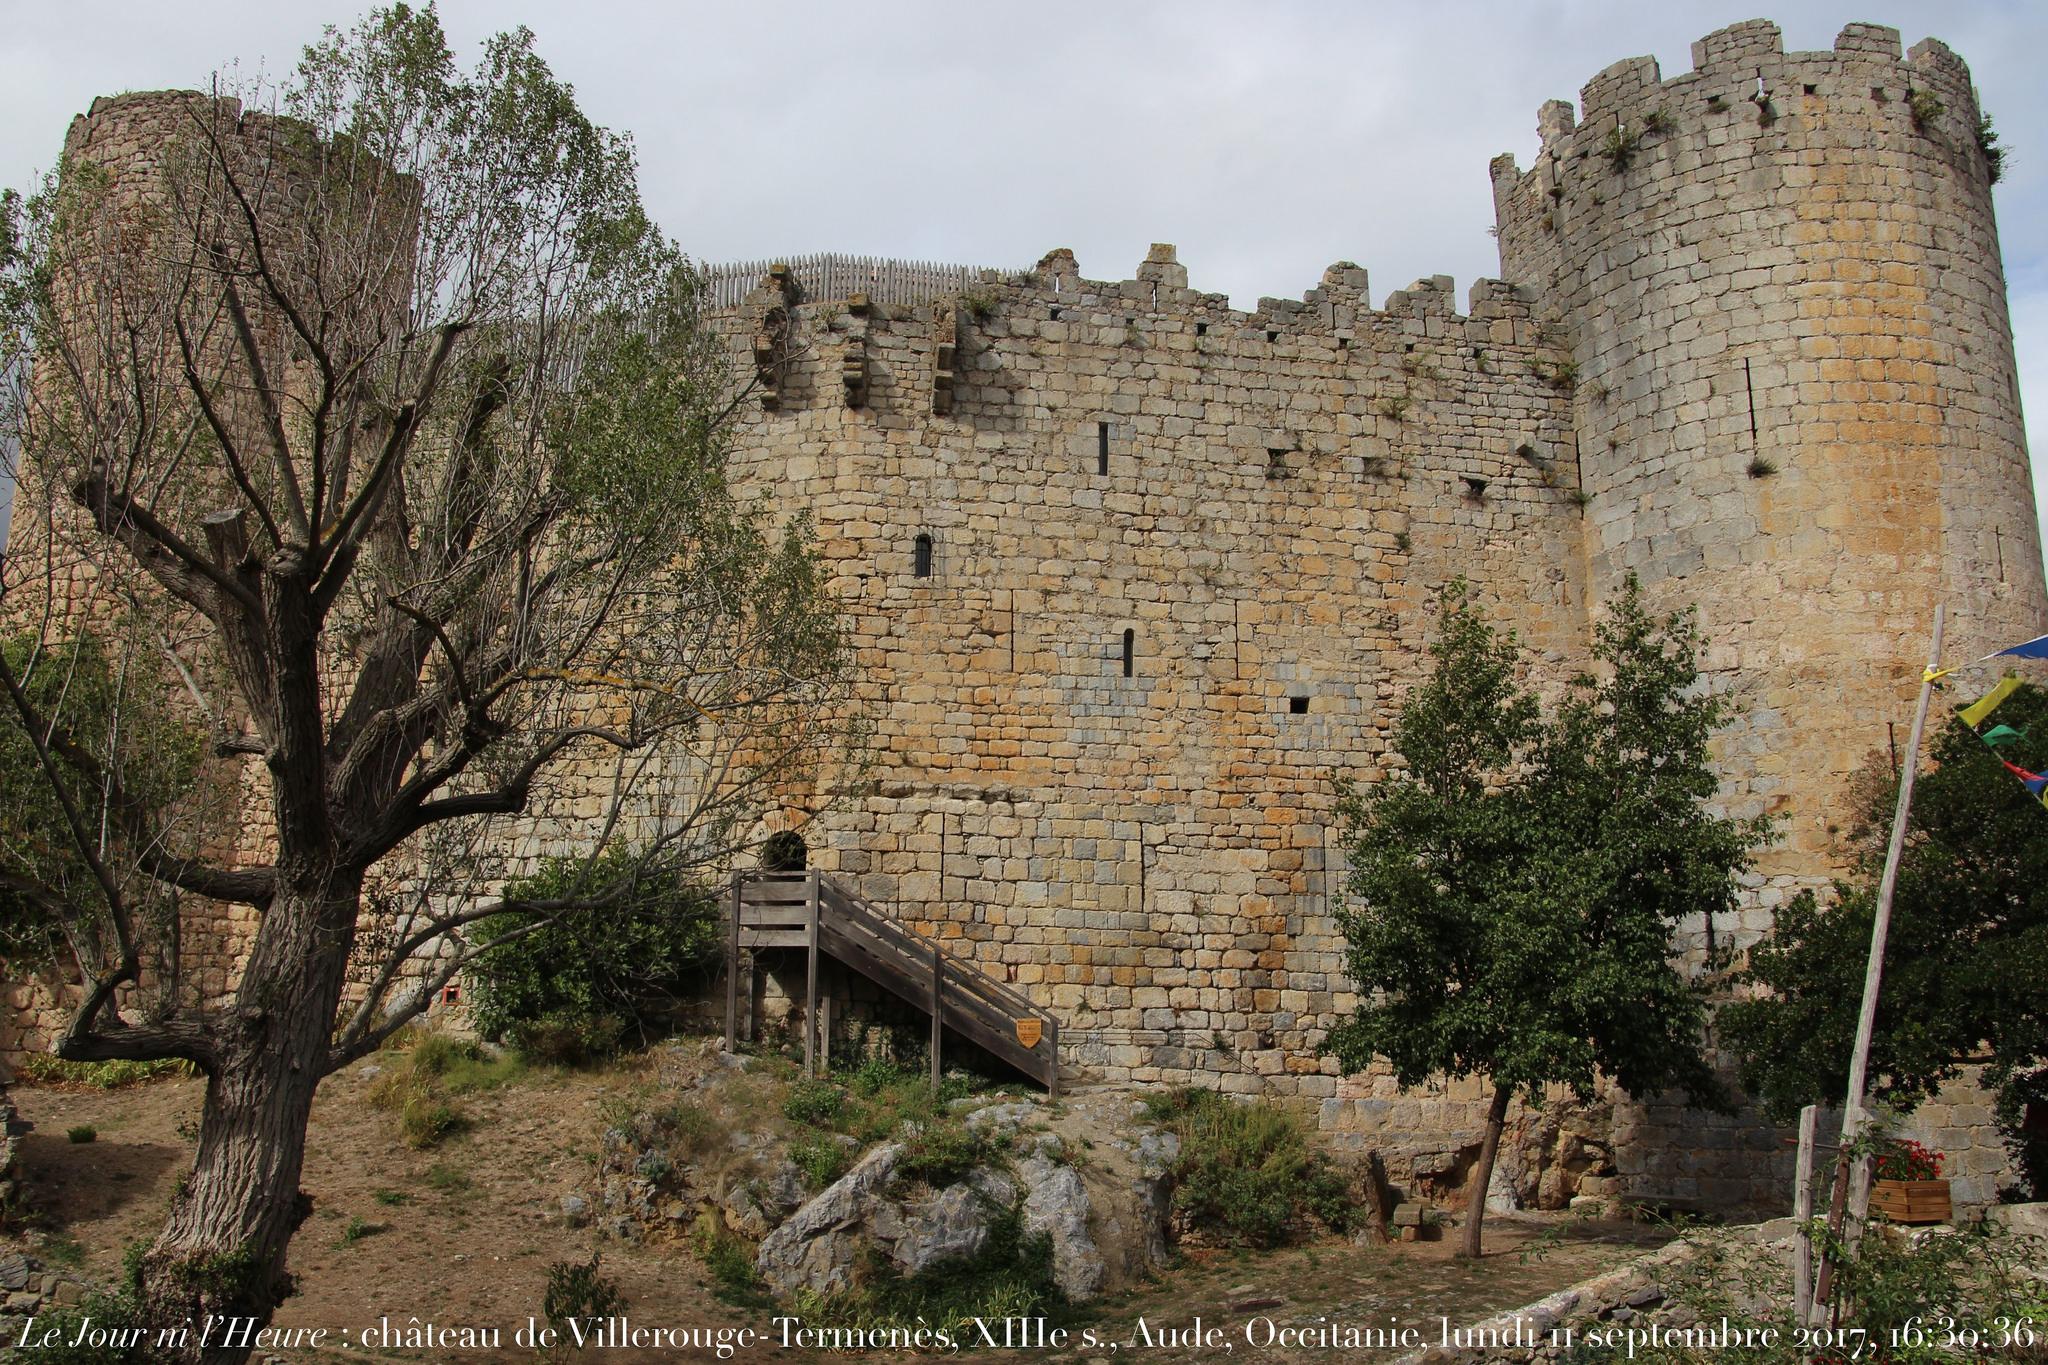 Chateau Villerouge-Termenes